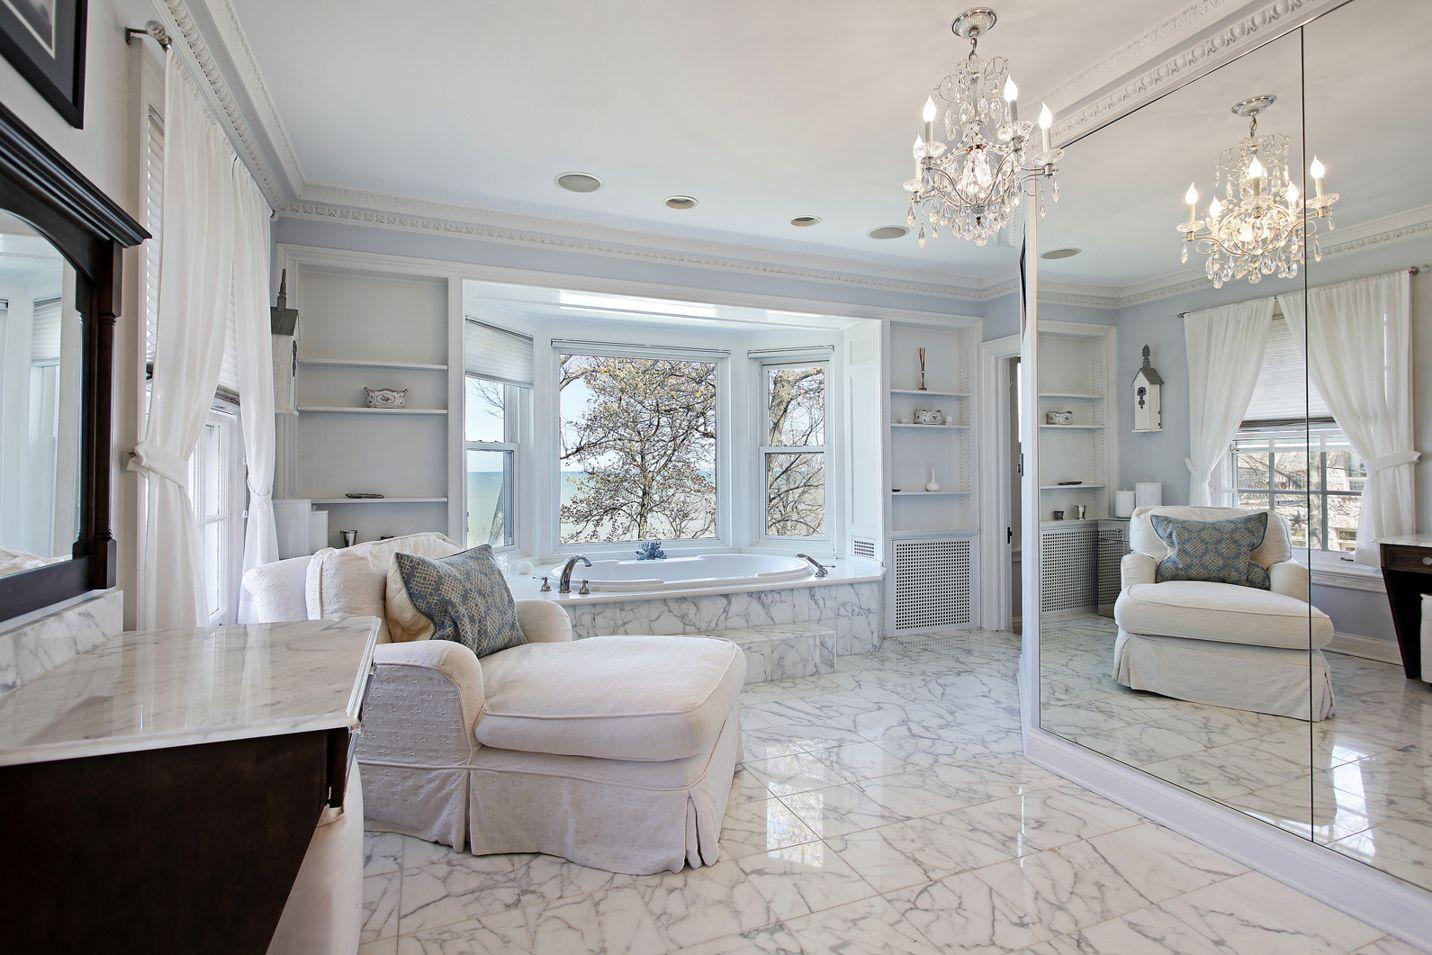 masterbathroom clalacata marble